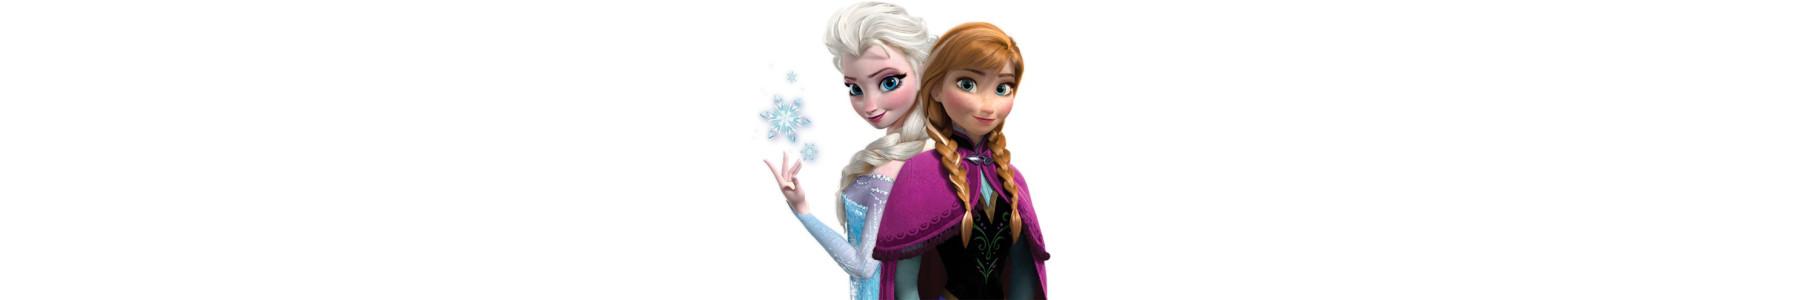 Articole de petrecere Frozen - accesorii de petrecere Frozen